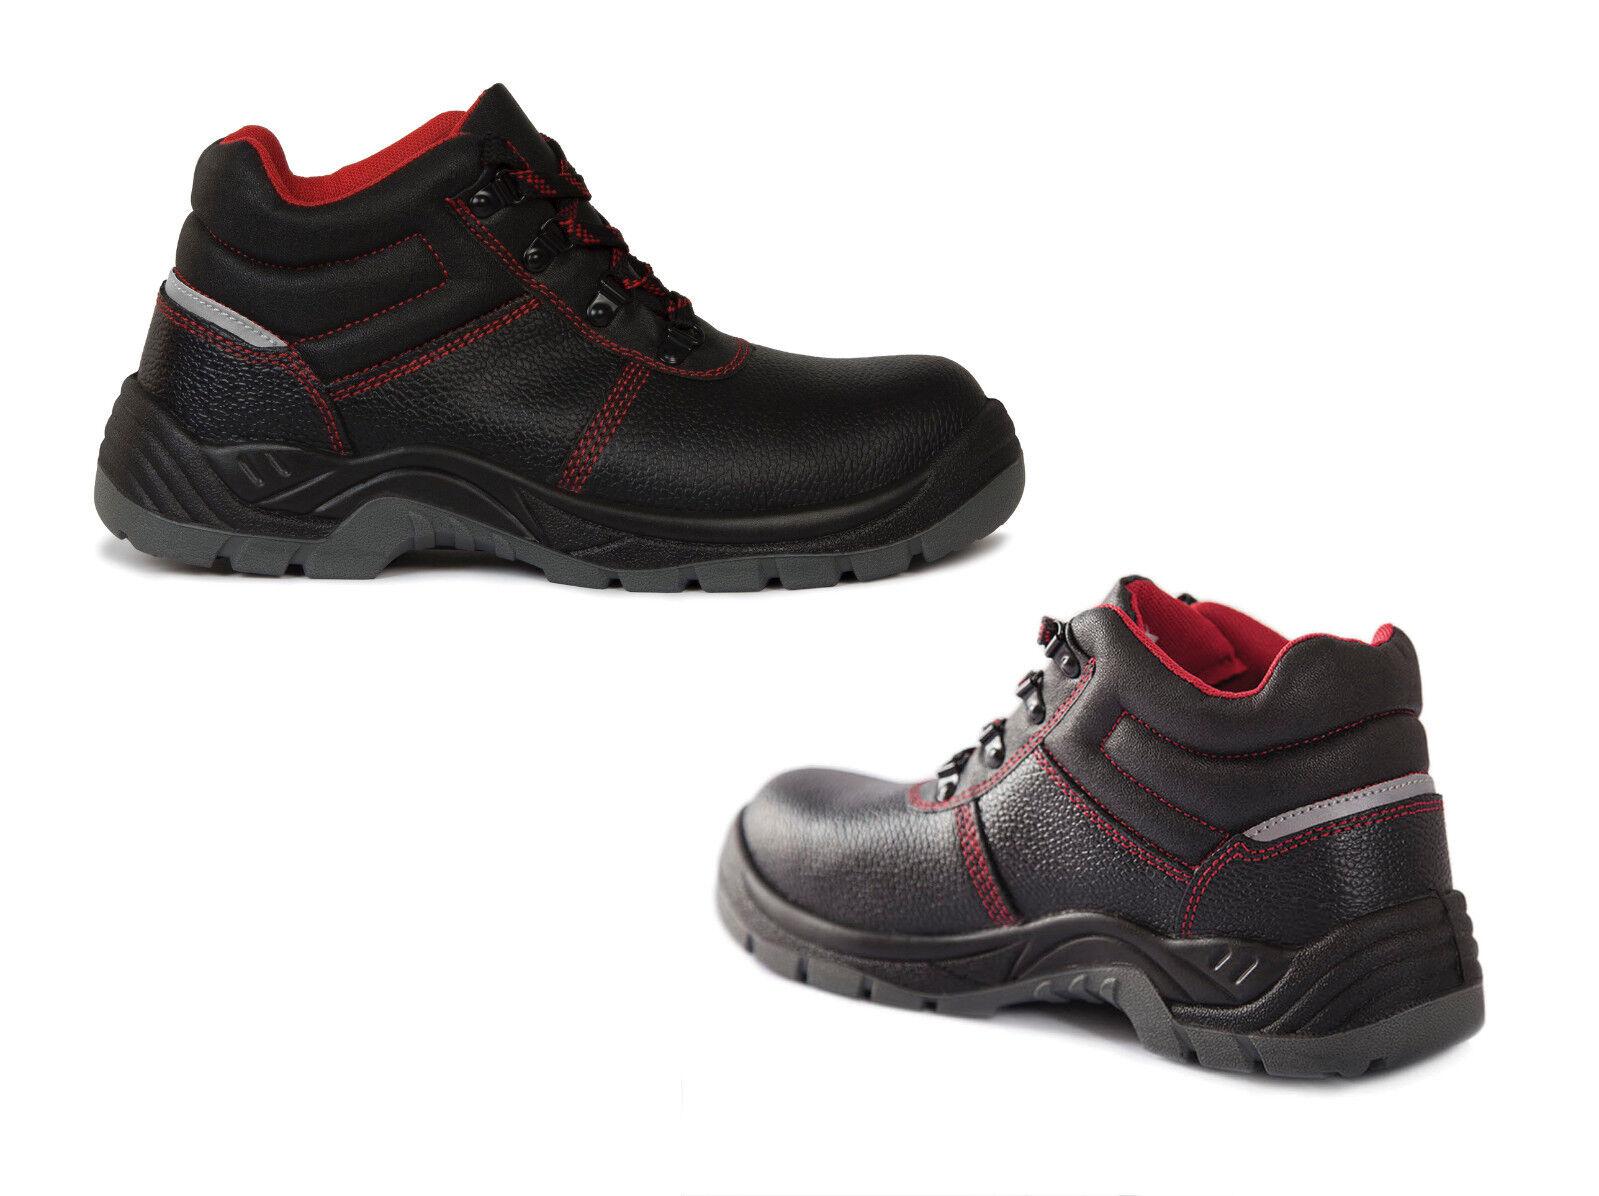 QUALITEX S3 Sicherheitsschuhe Arbeitsschuhe Schuhe Halbschuhe Bau 36-48 NEU